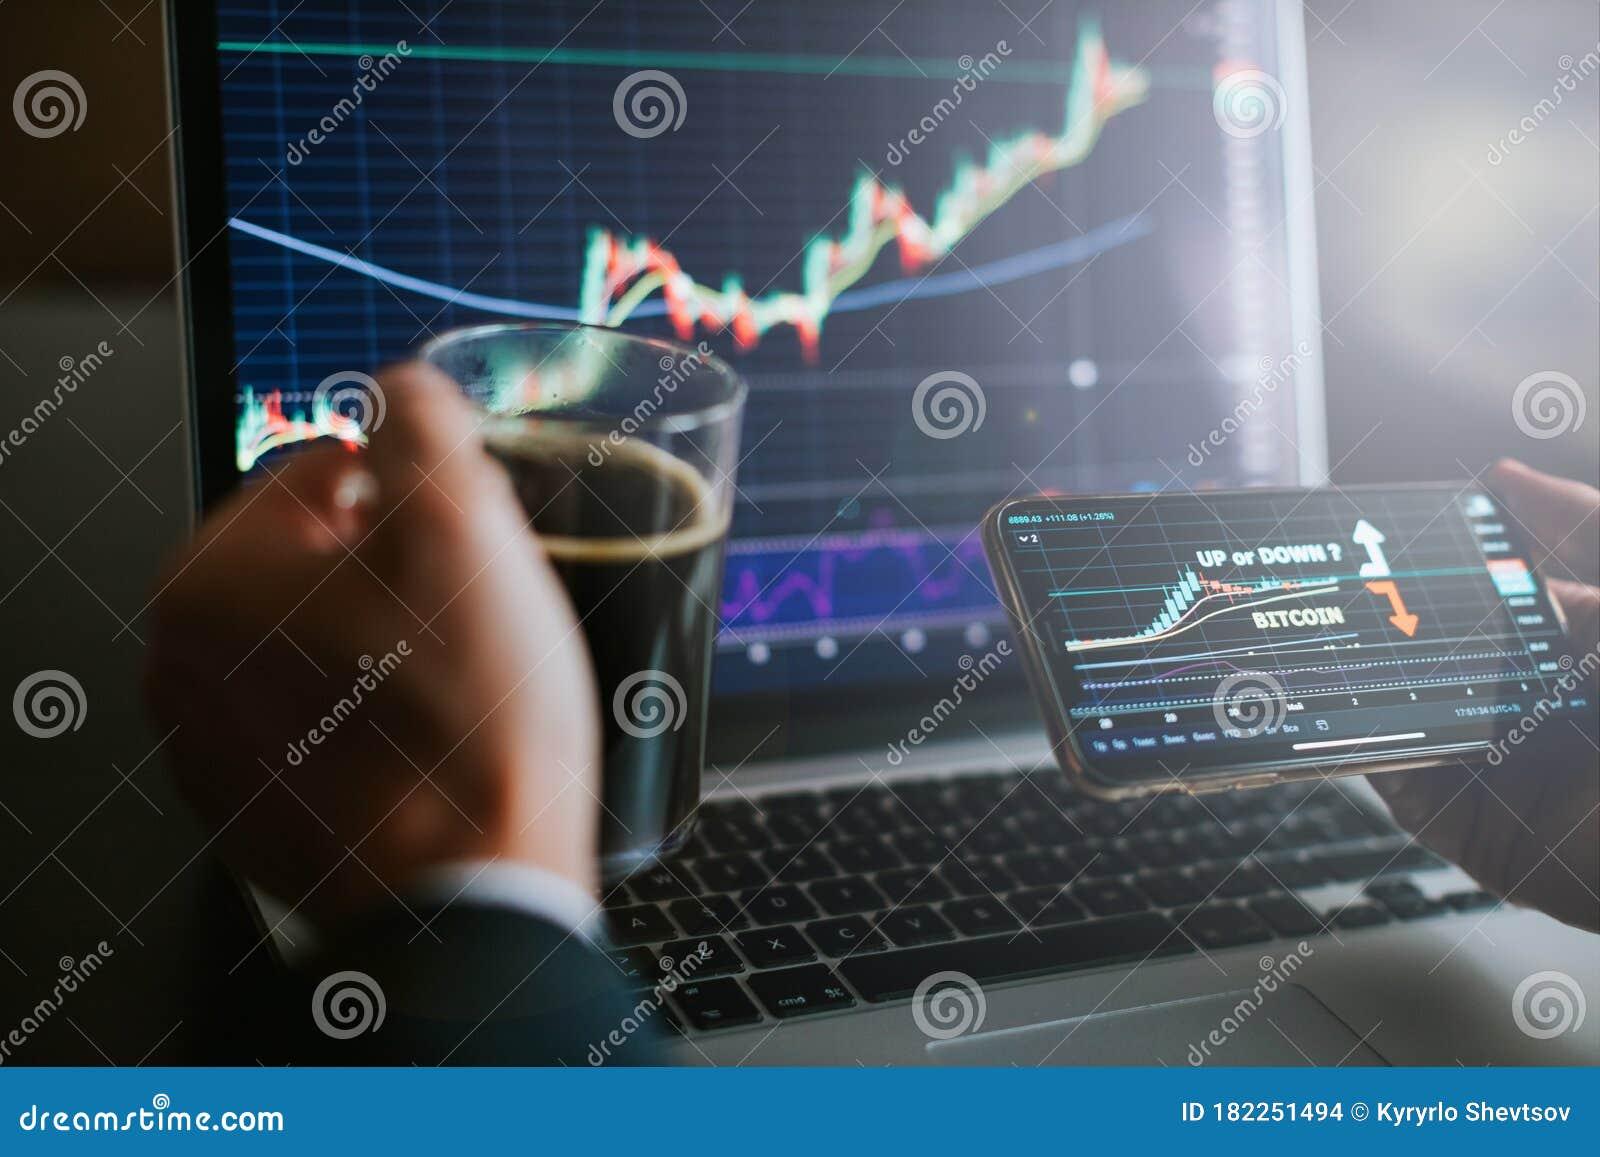 stockbrokers bitcoin)